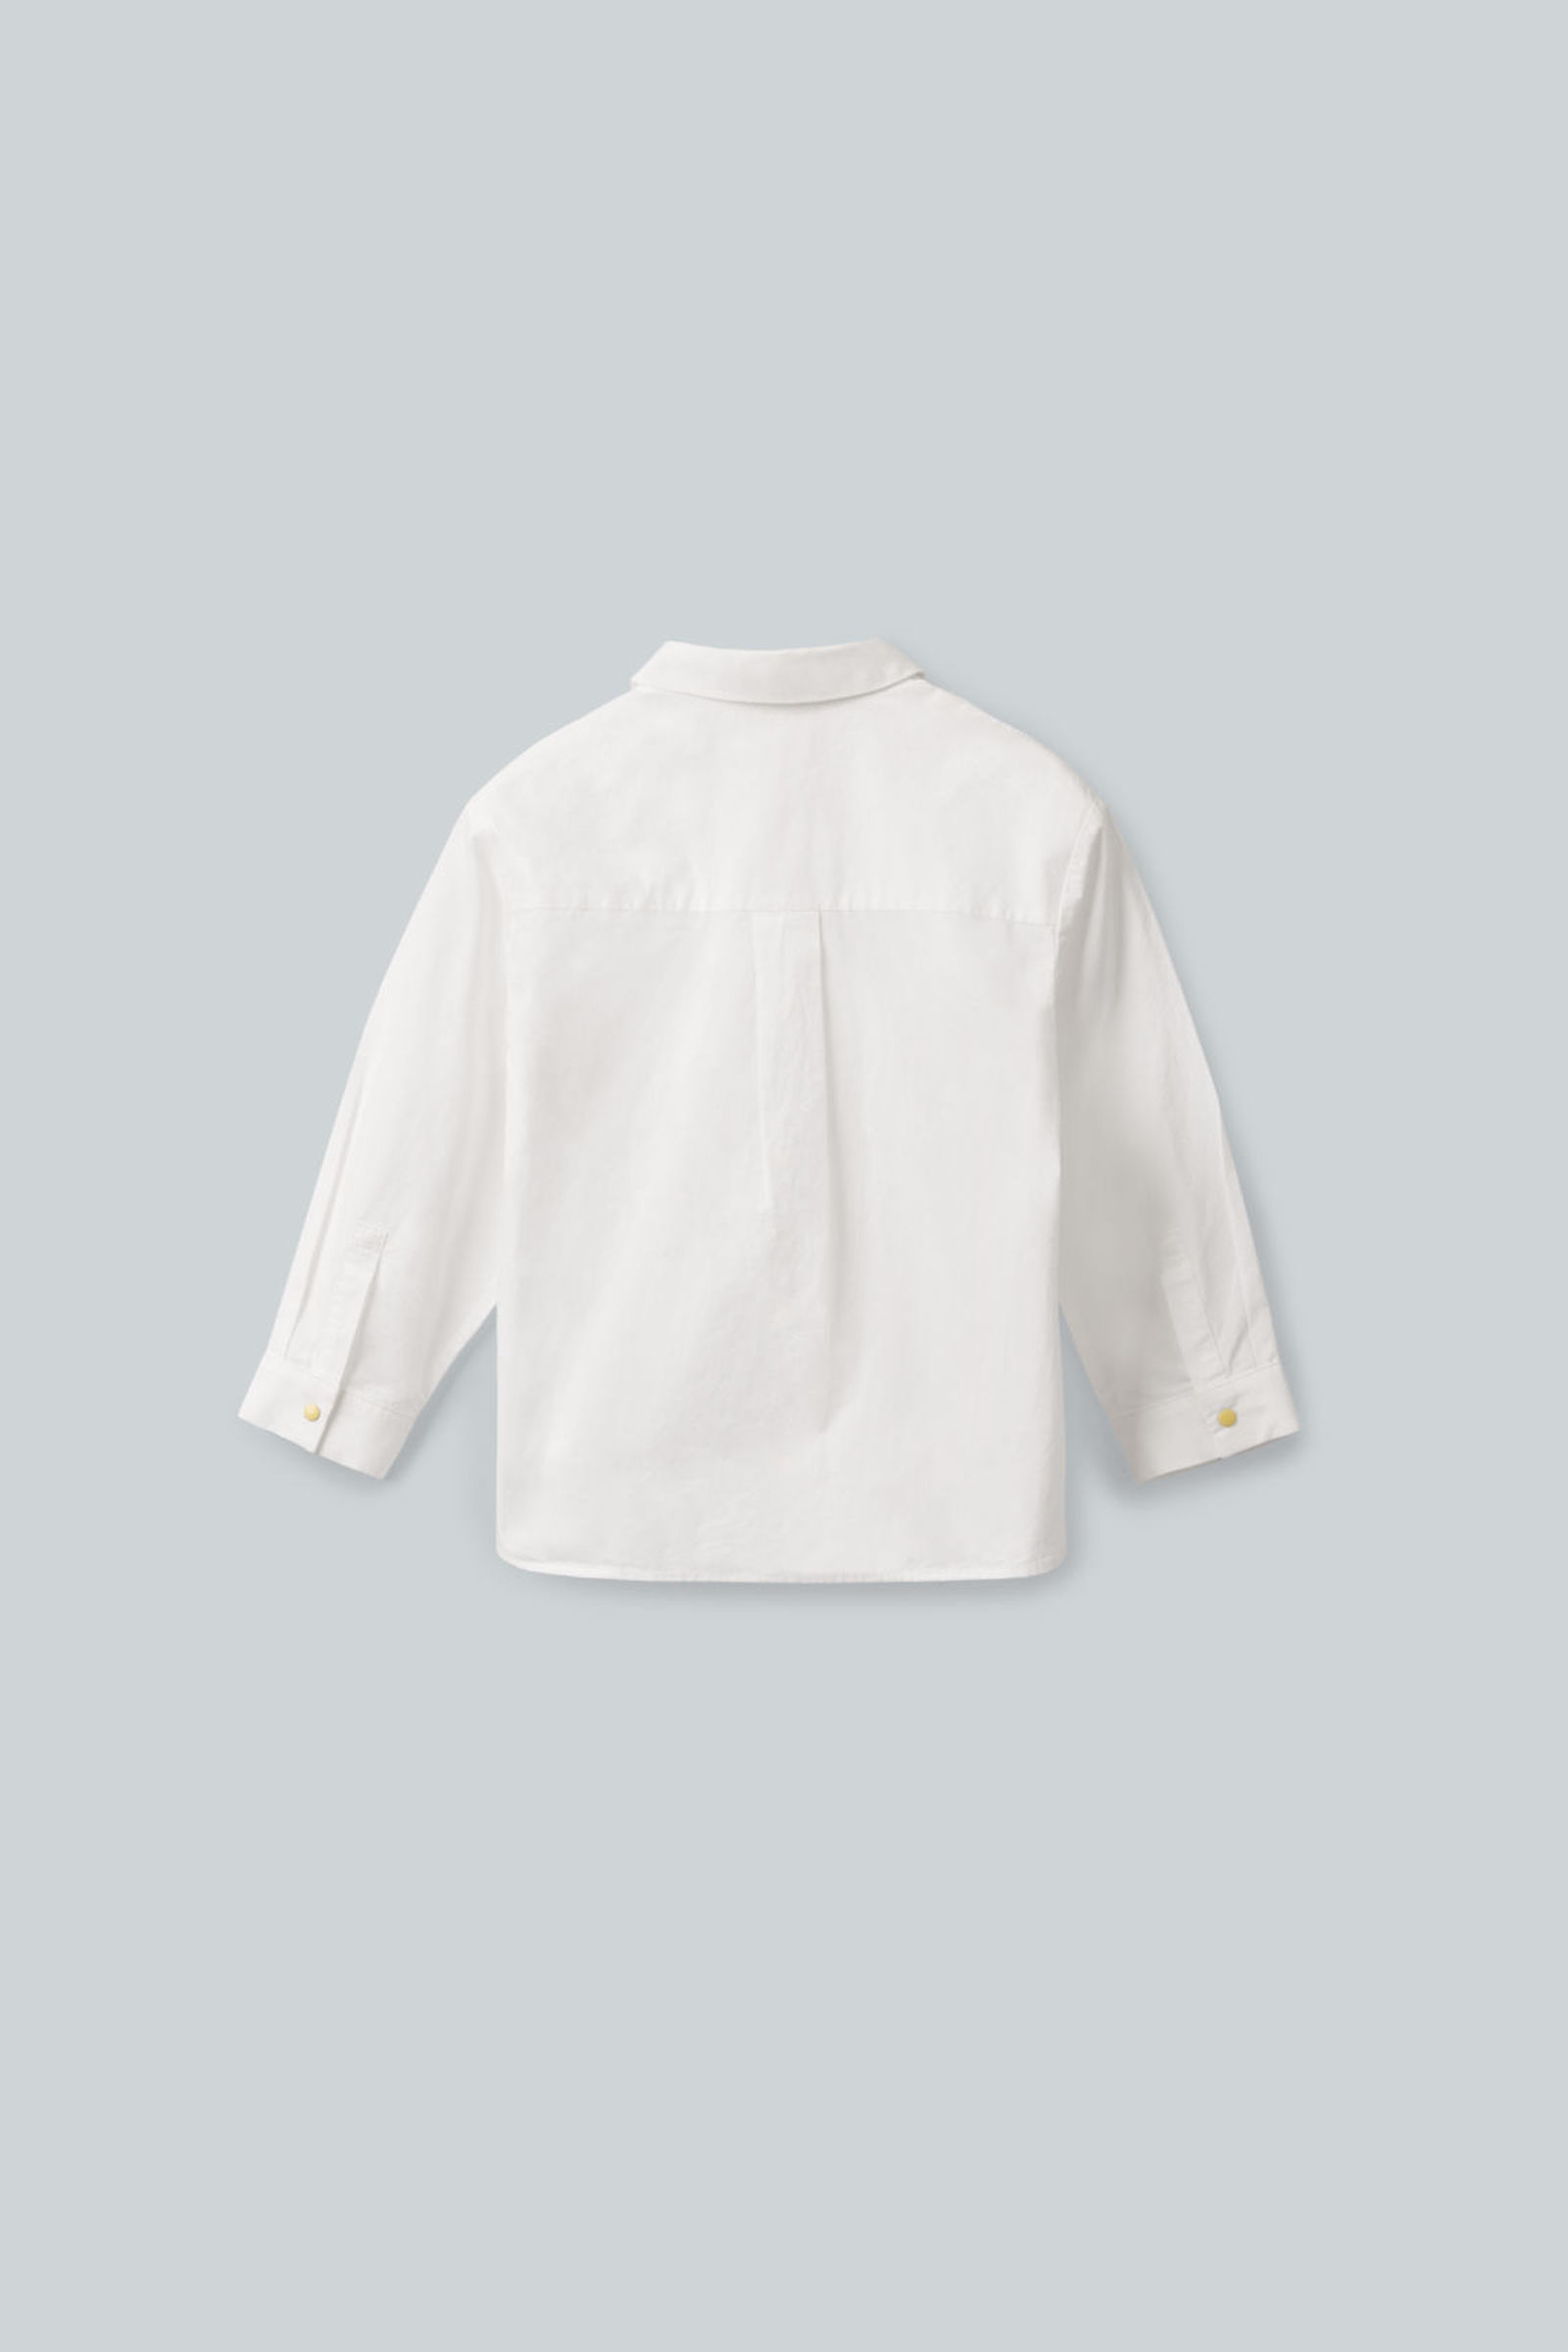 COS 클래식 코튼 셔츠의 화이트컬러 상품컷입니다.